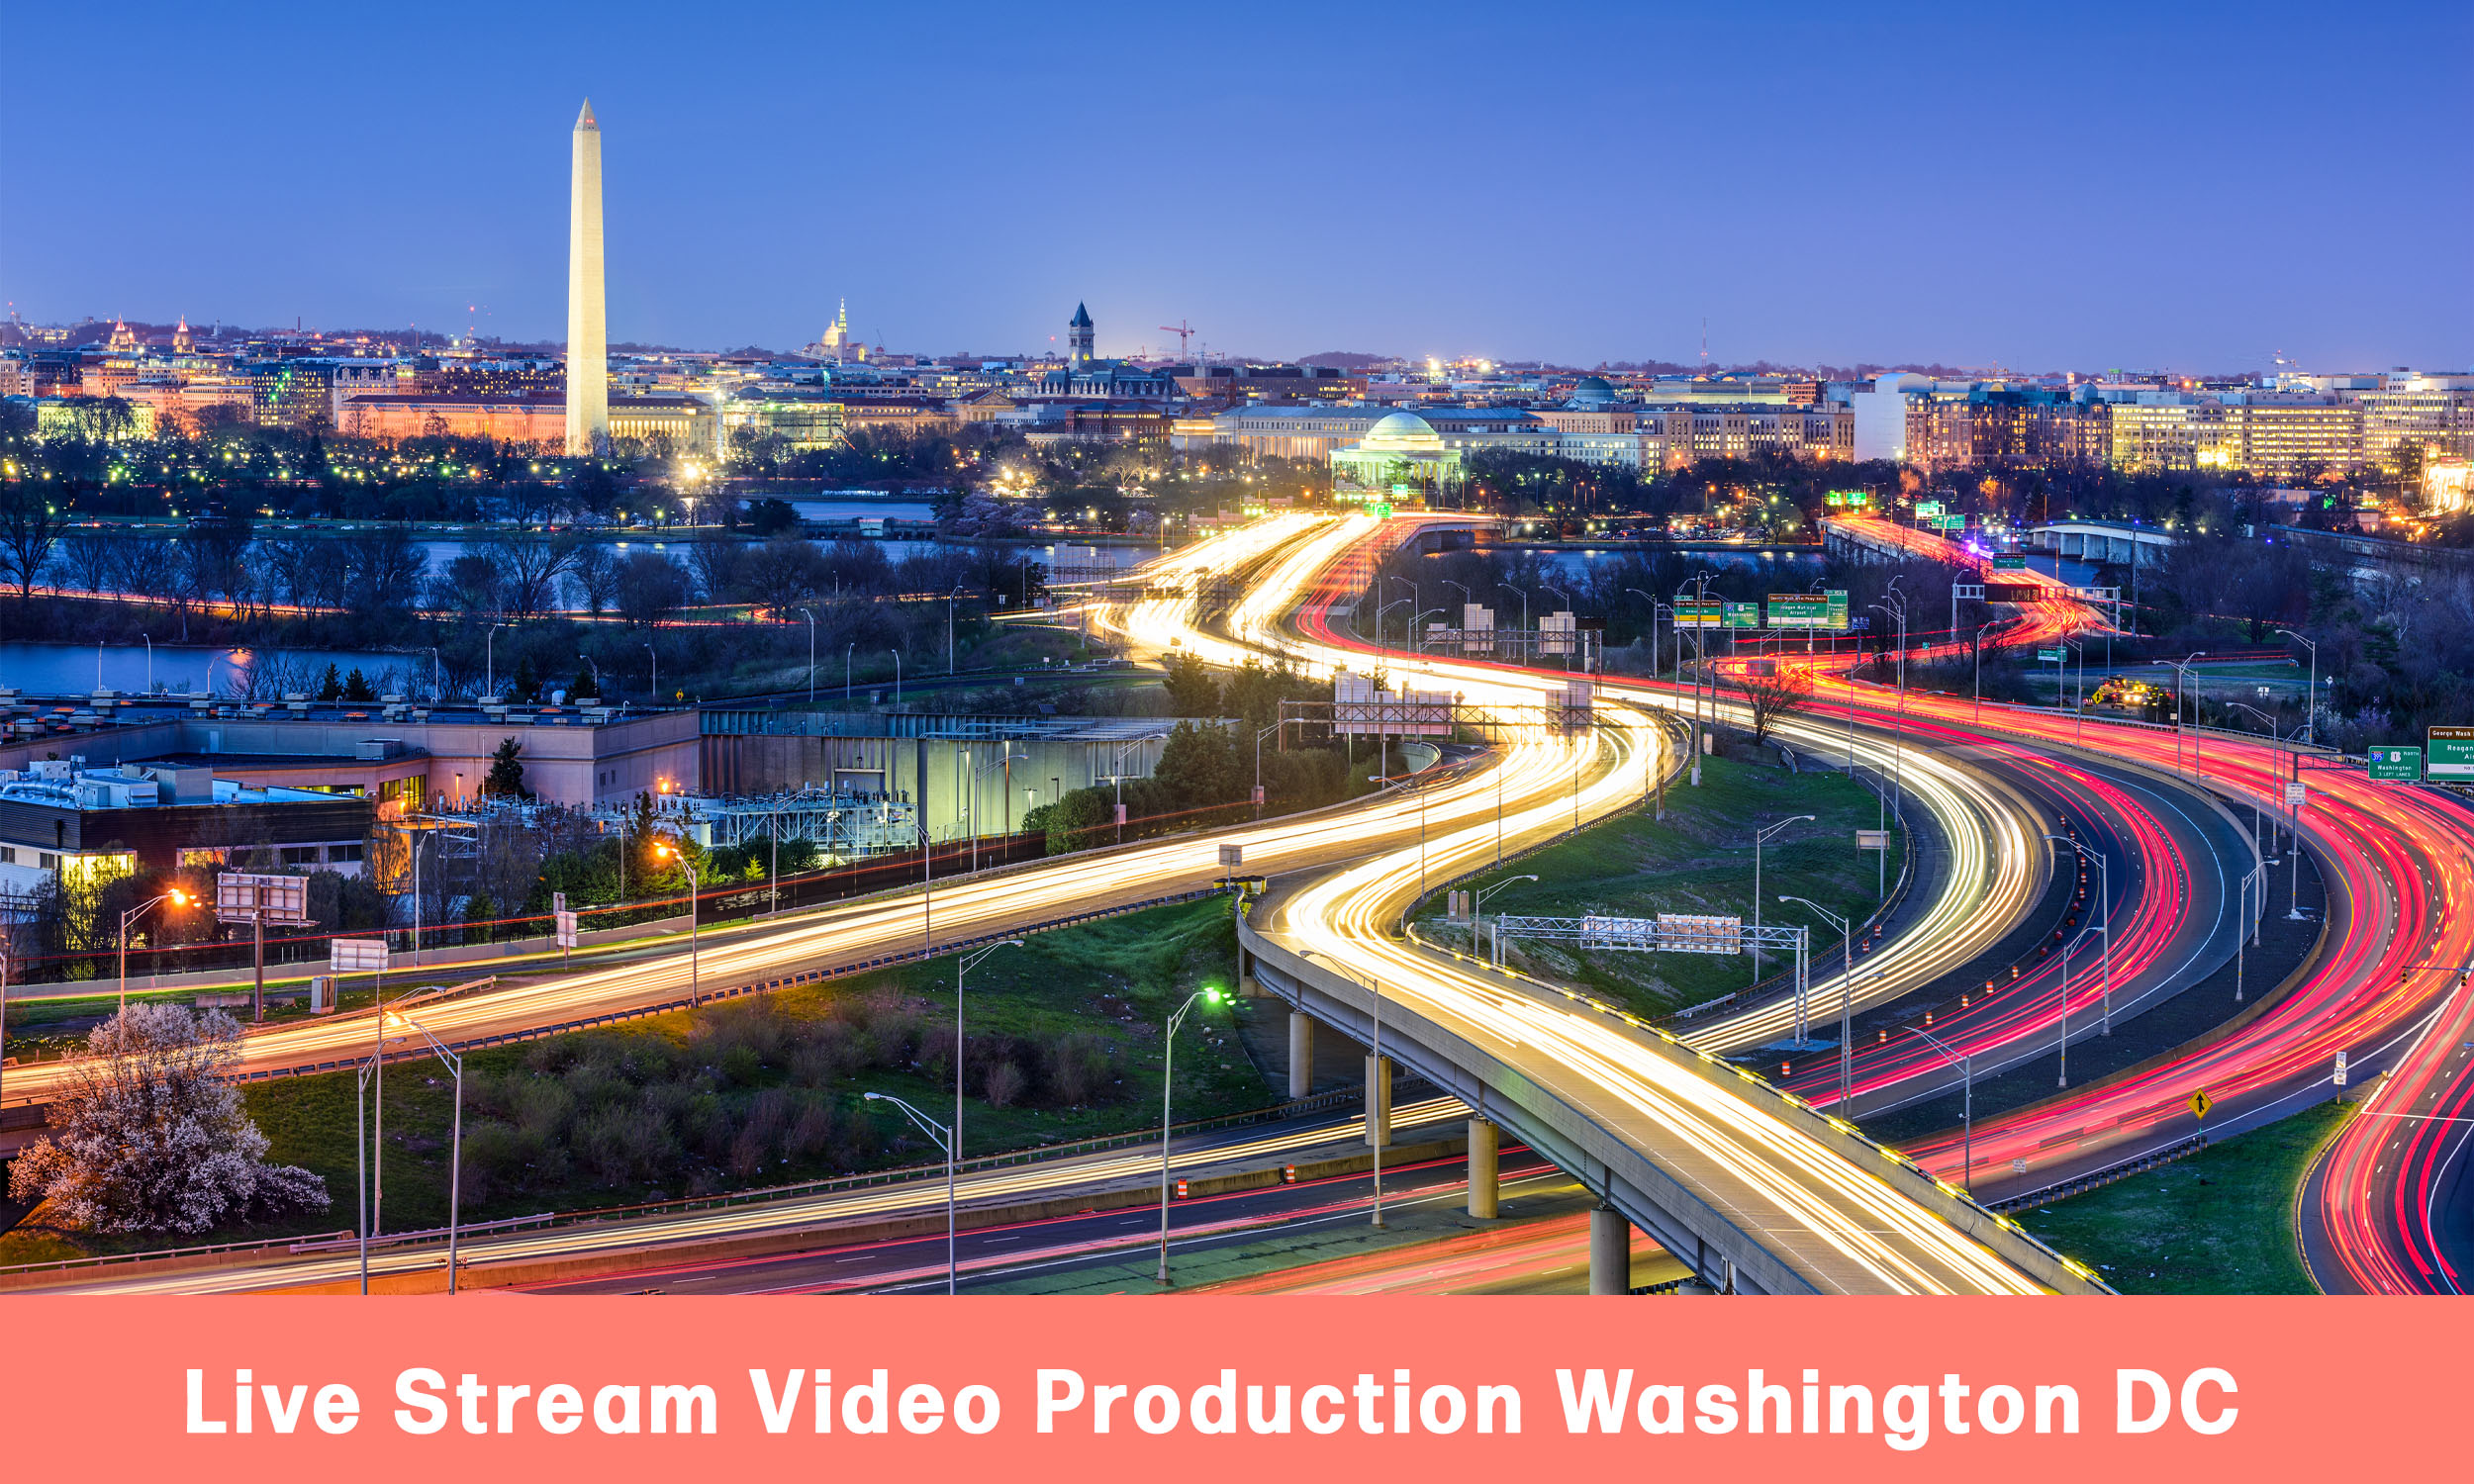 Live Stream Video Production Washington DC